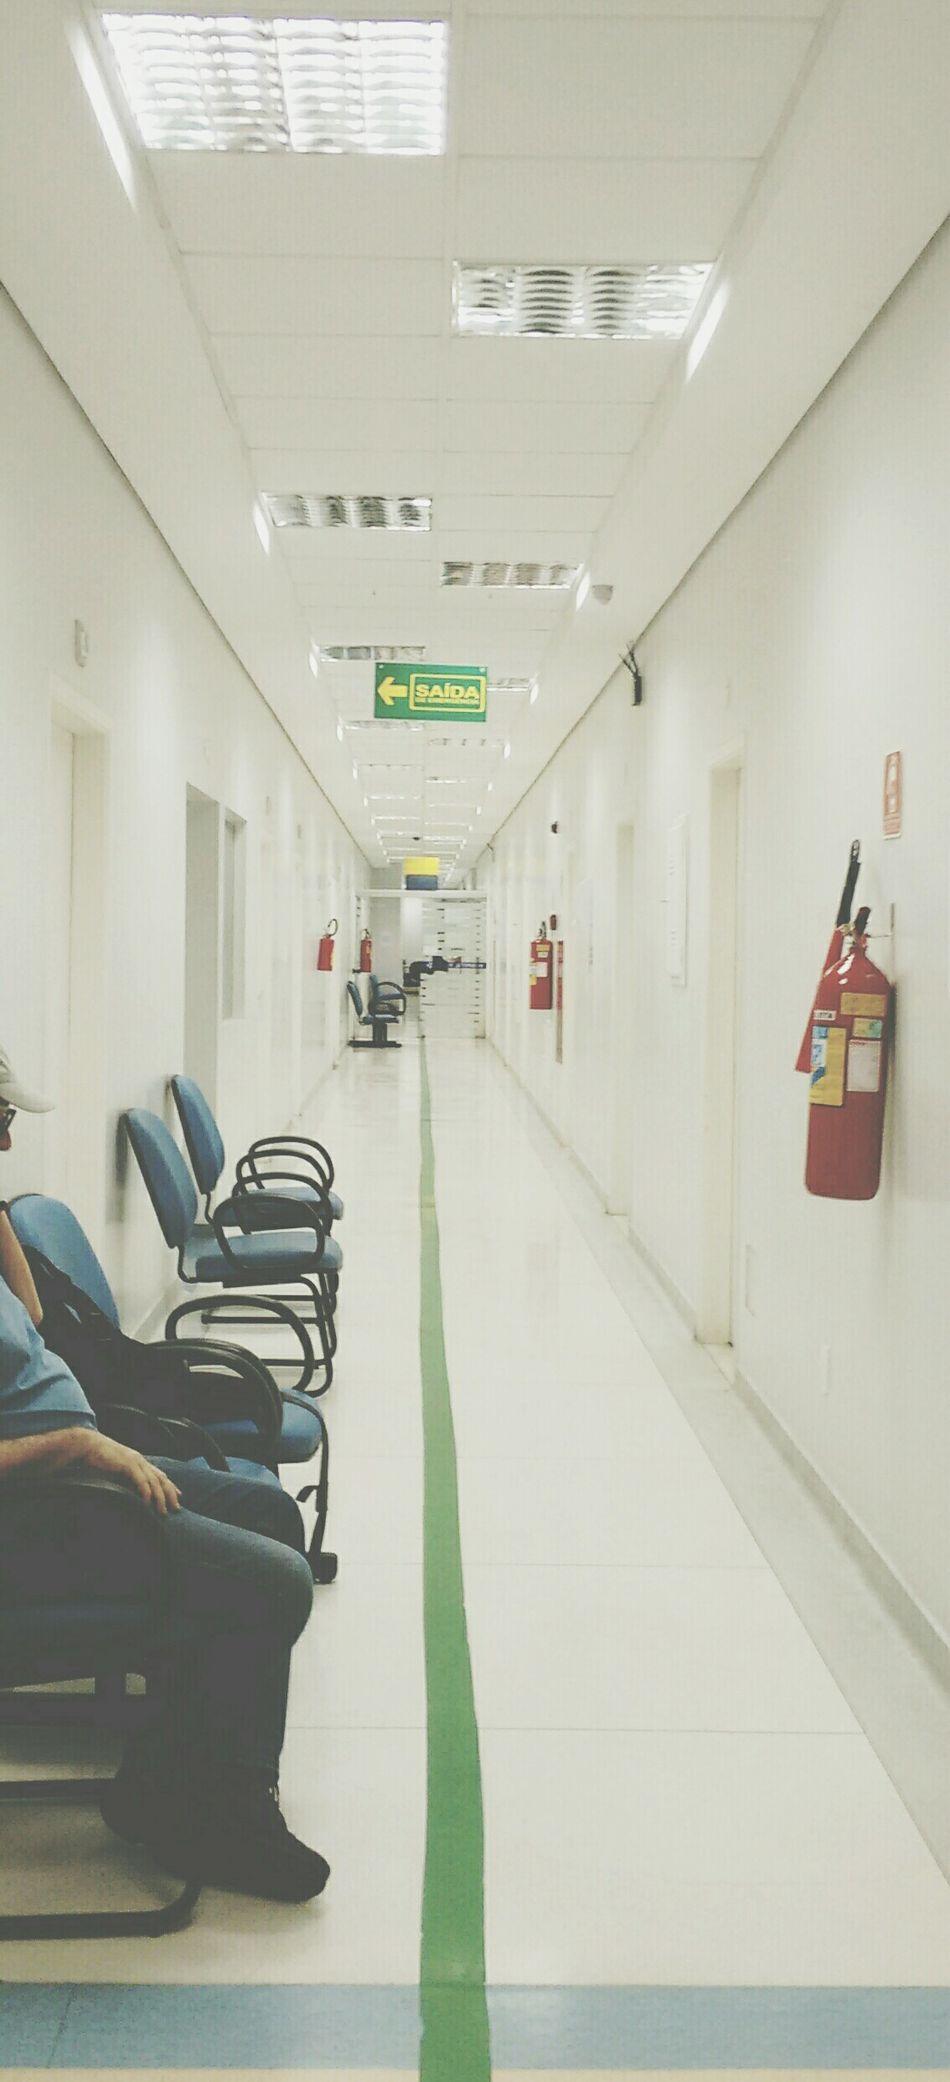 Pastel Power Emergencyroom Empty Empty Corridor